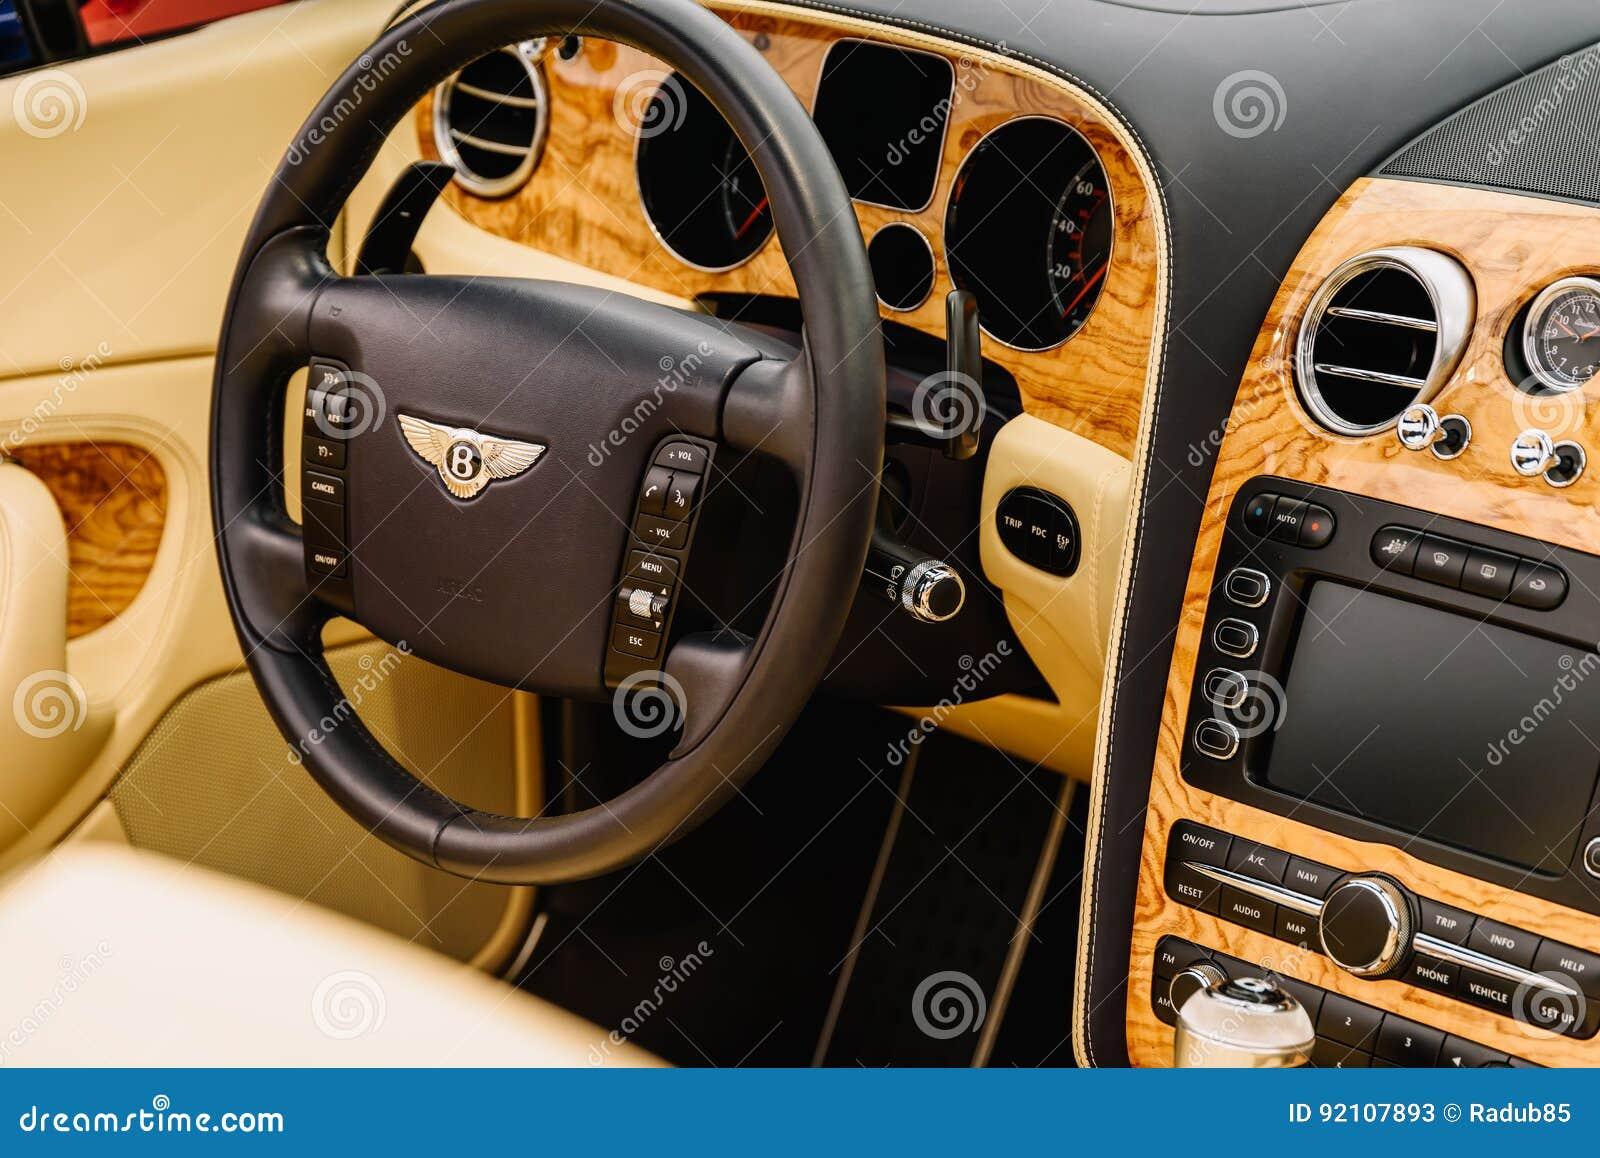 Bentley Luxury Car Interior Foto De Stock Editorial Imagem De Luxury Bentley 92107893